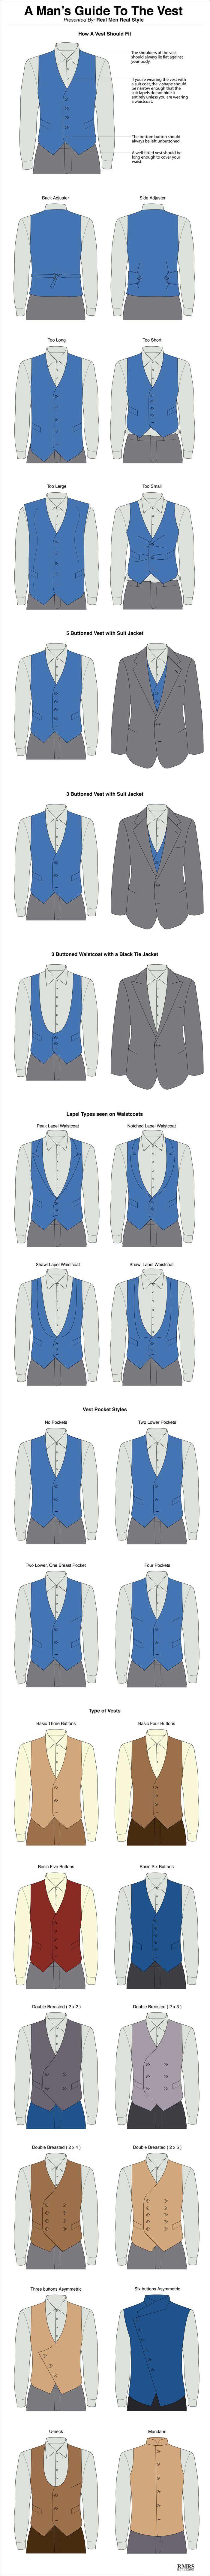 Pinstripe Ibiza vest  Mens Vests  Unisex Waistcoat  Cotton Mens Waistcoat   Mens Clothing   by NAYWAJ